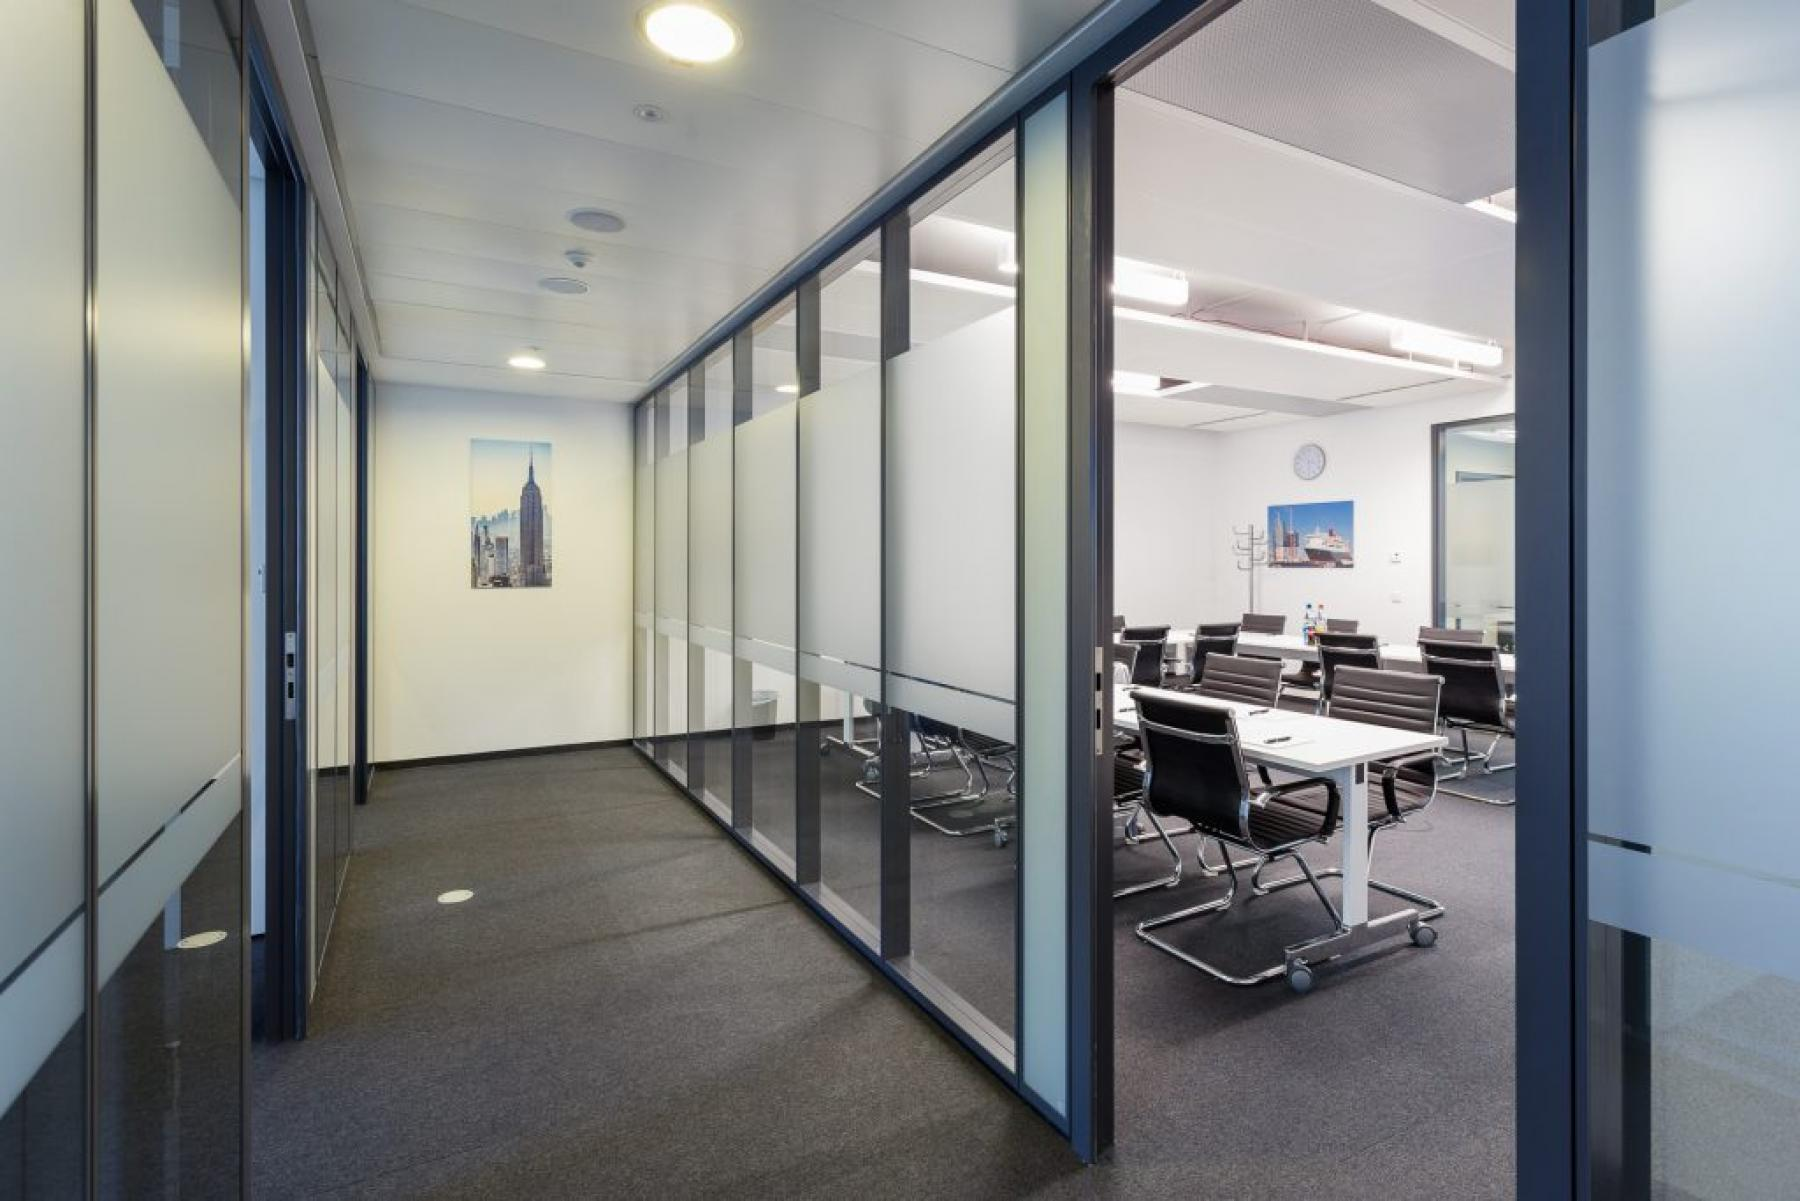 Modernes Büro mieten in Frankfurt Hauptbahnhof